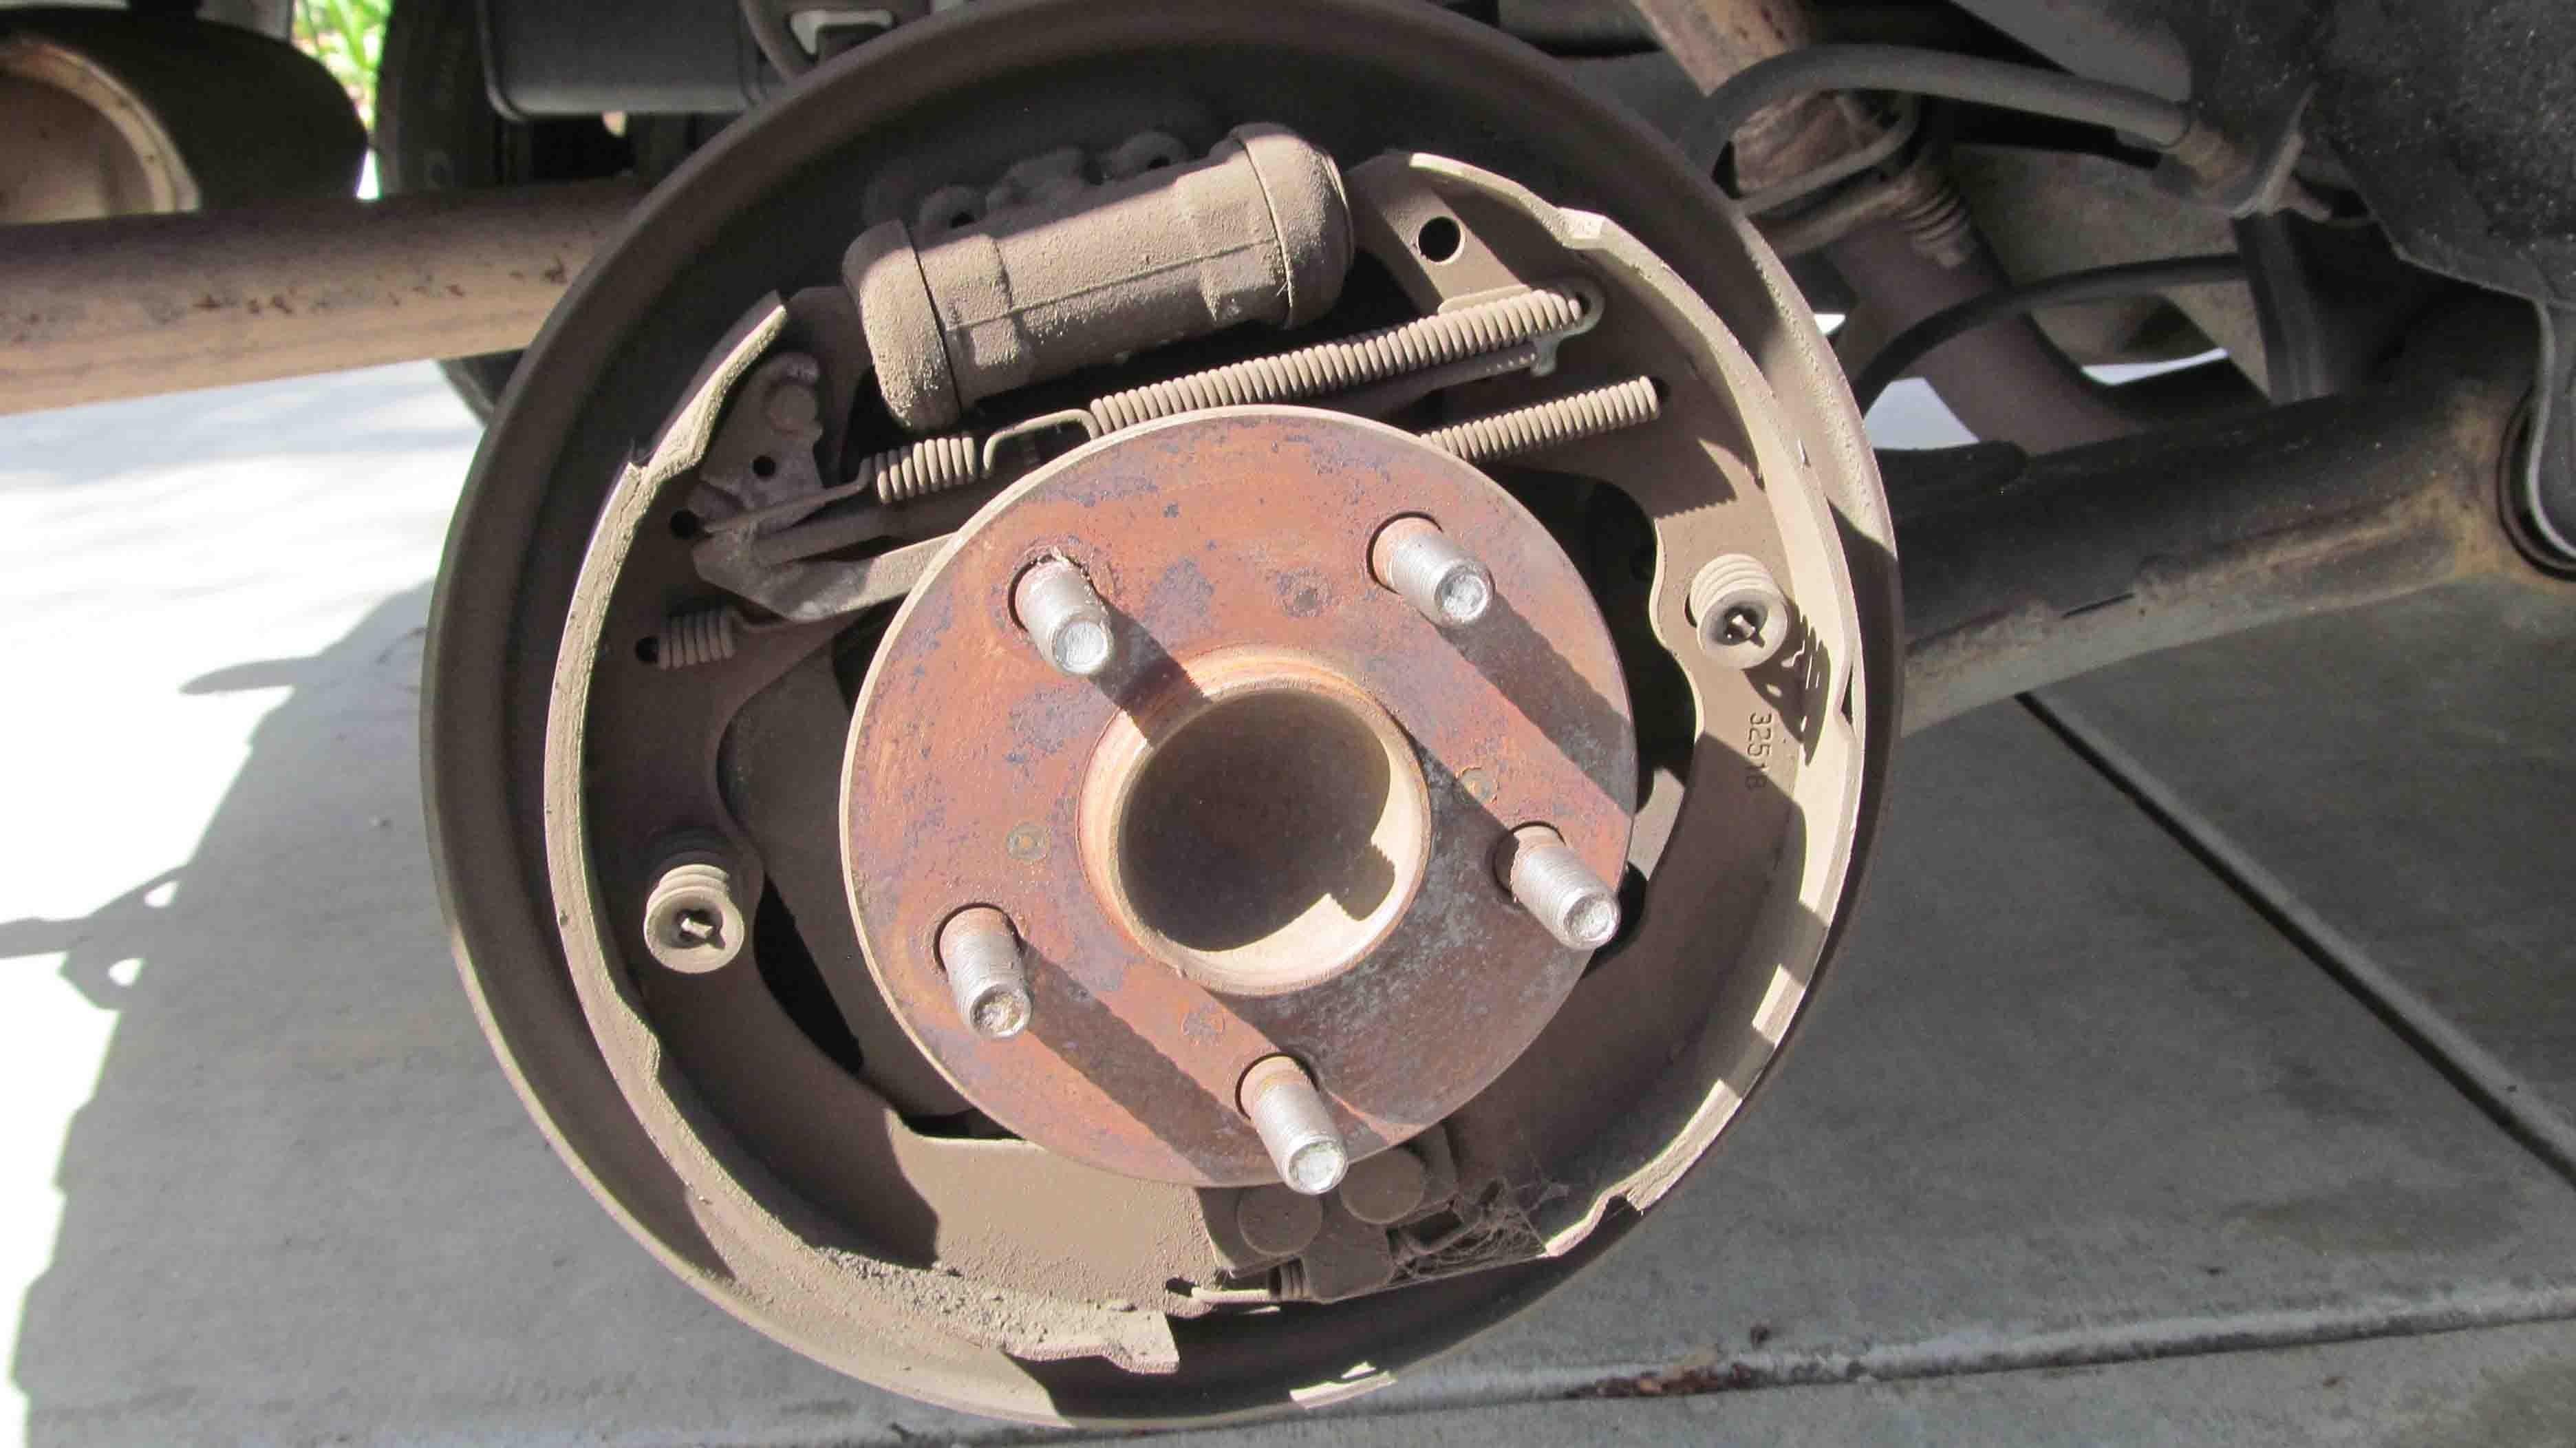 Brake Drum Diagram Diy Replace Rear Drum Brake Shoes for toyota Corolla Matrix 2003 Of Brake Drum Diagram